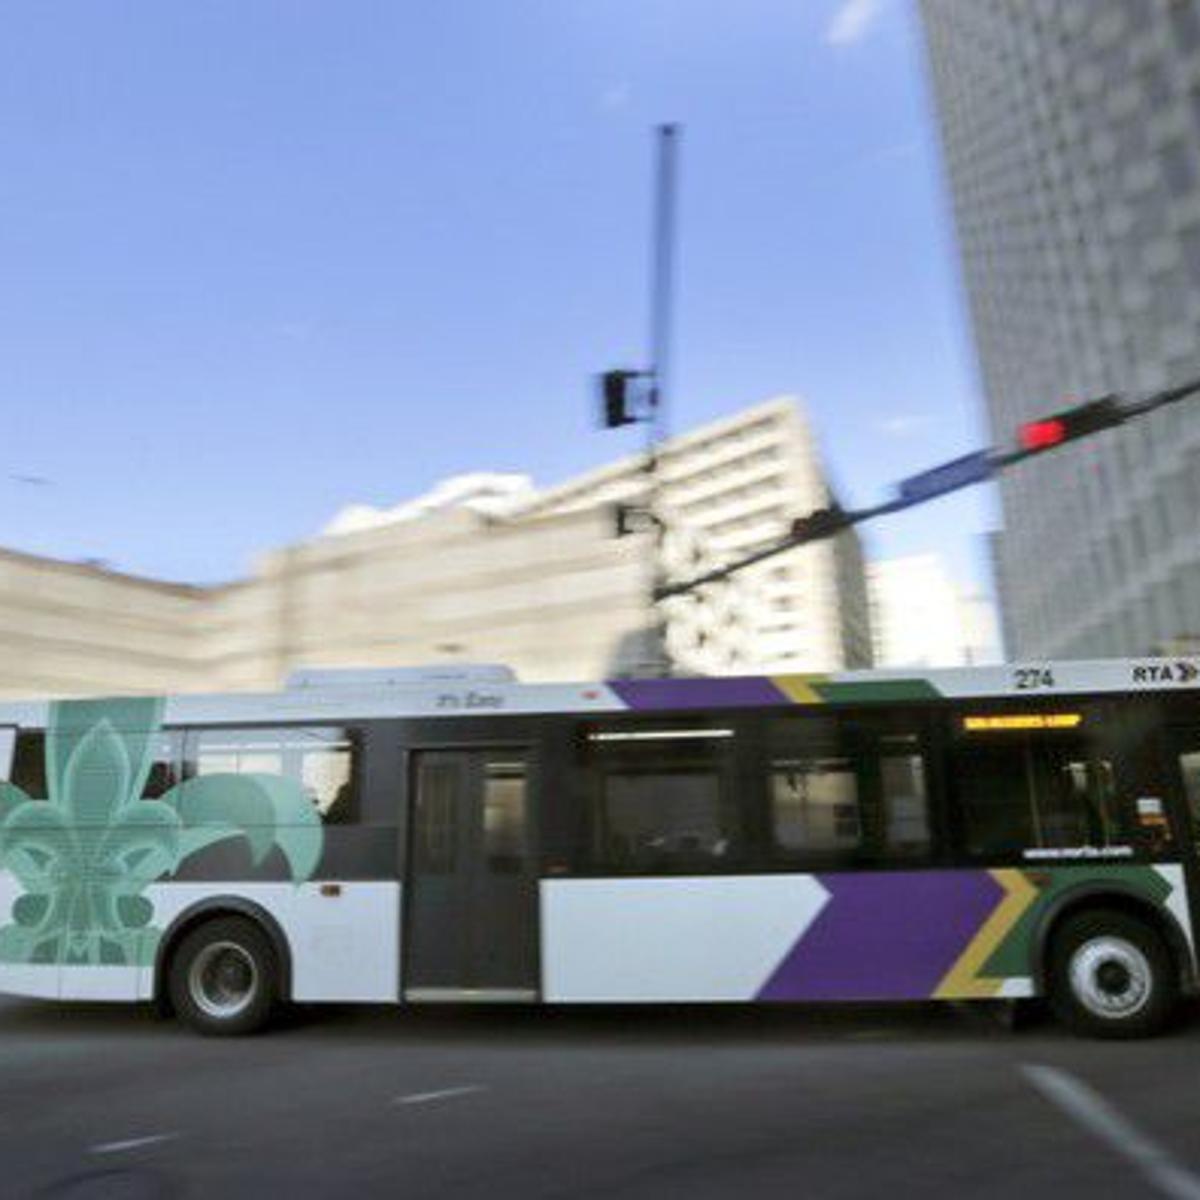 As Its Fleet Ages Rta Seeks Federal Money For New Buses Paratransit Vehicles Local Politics Nola Com